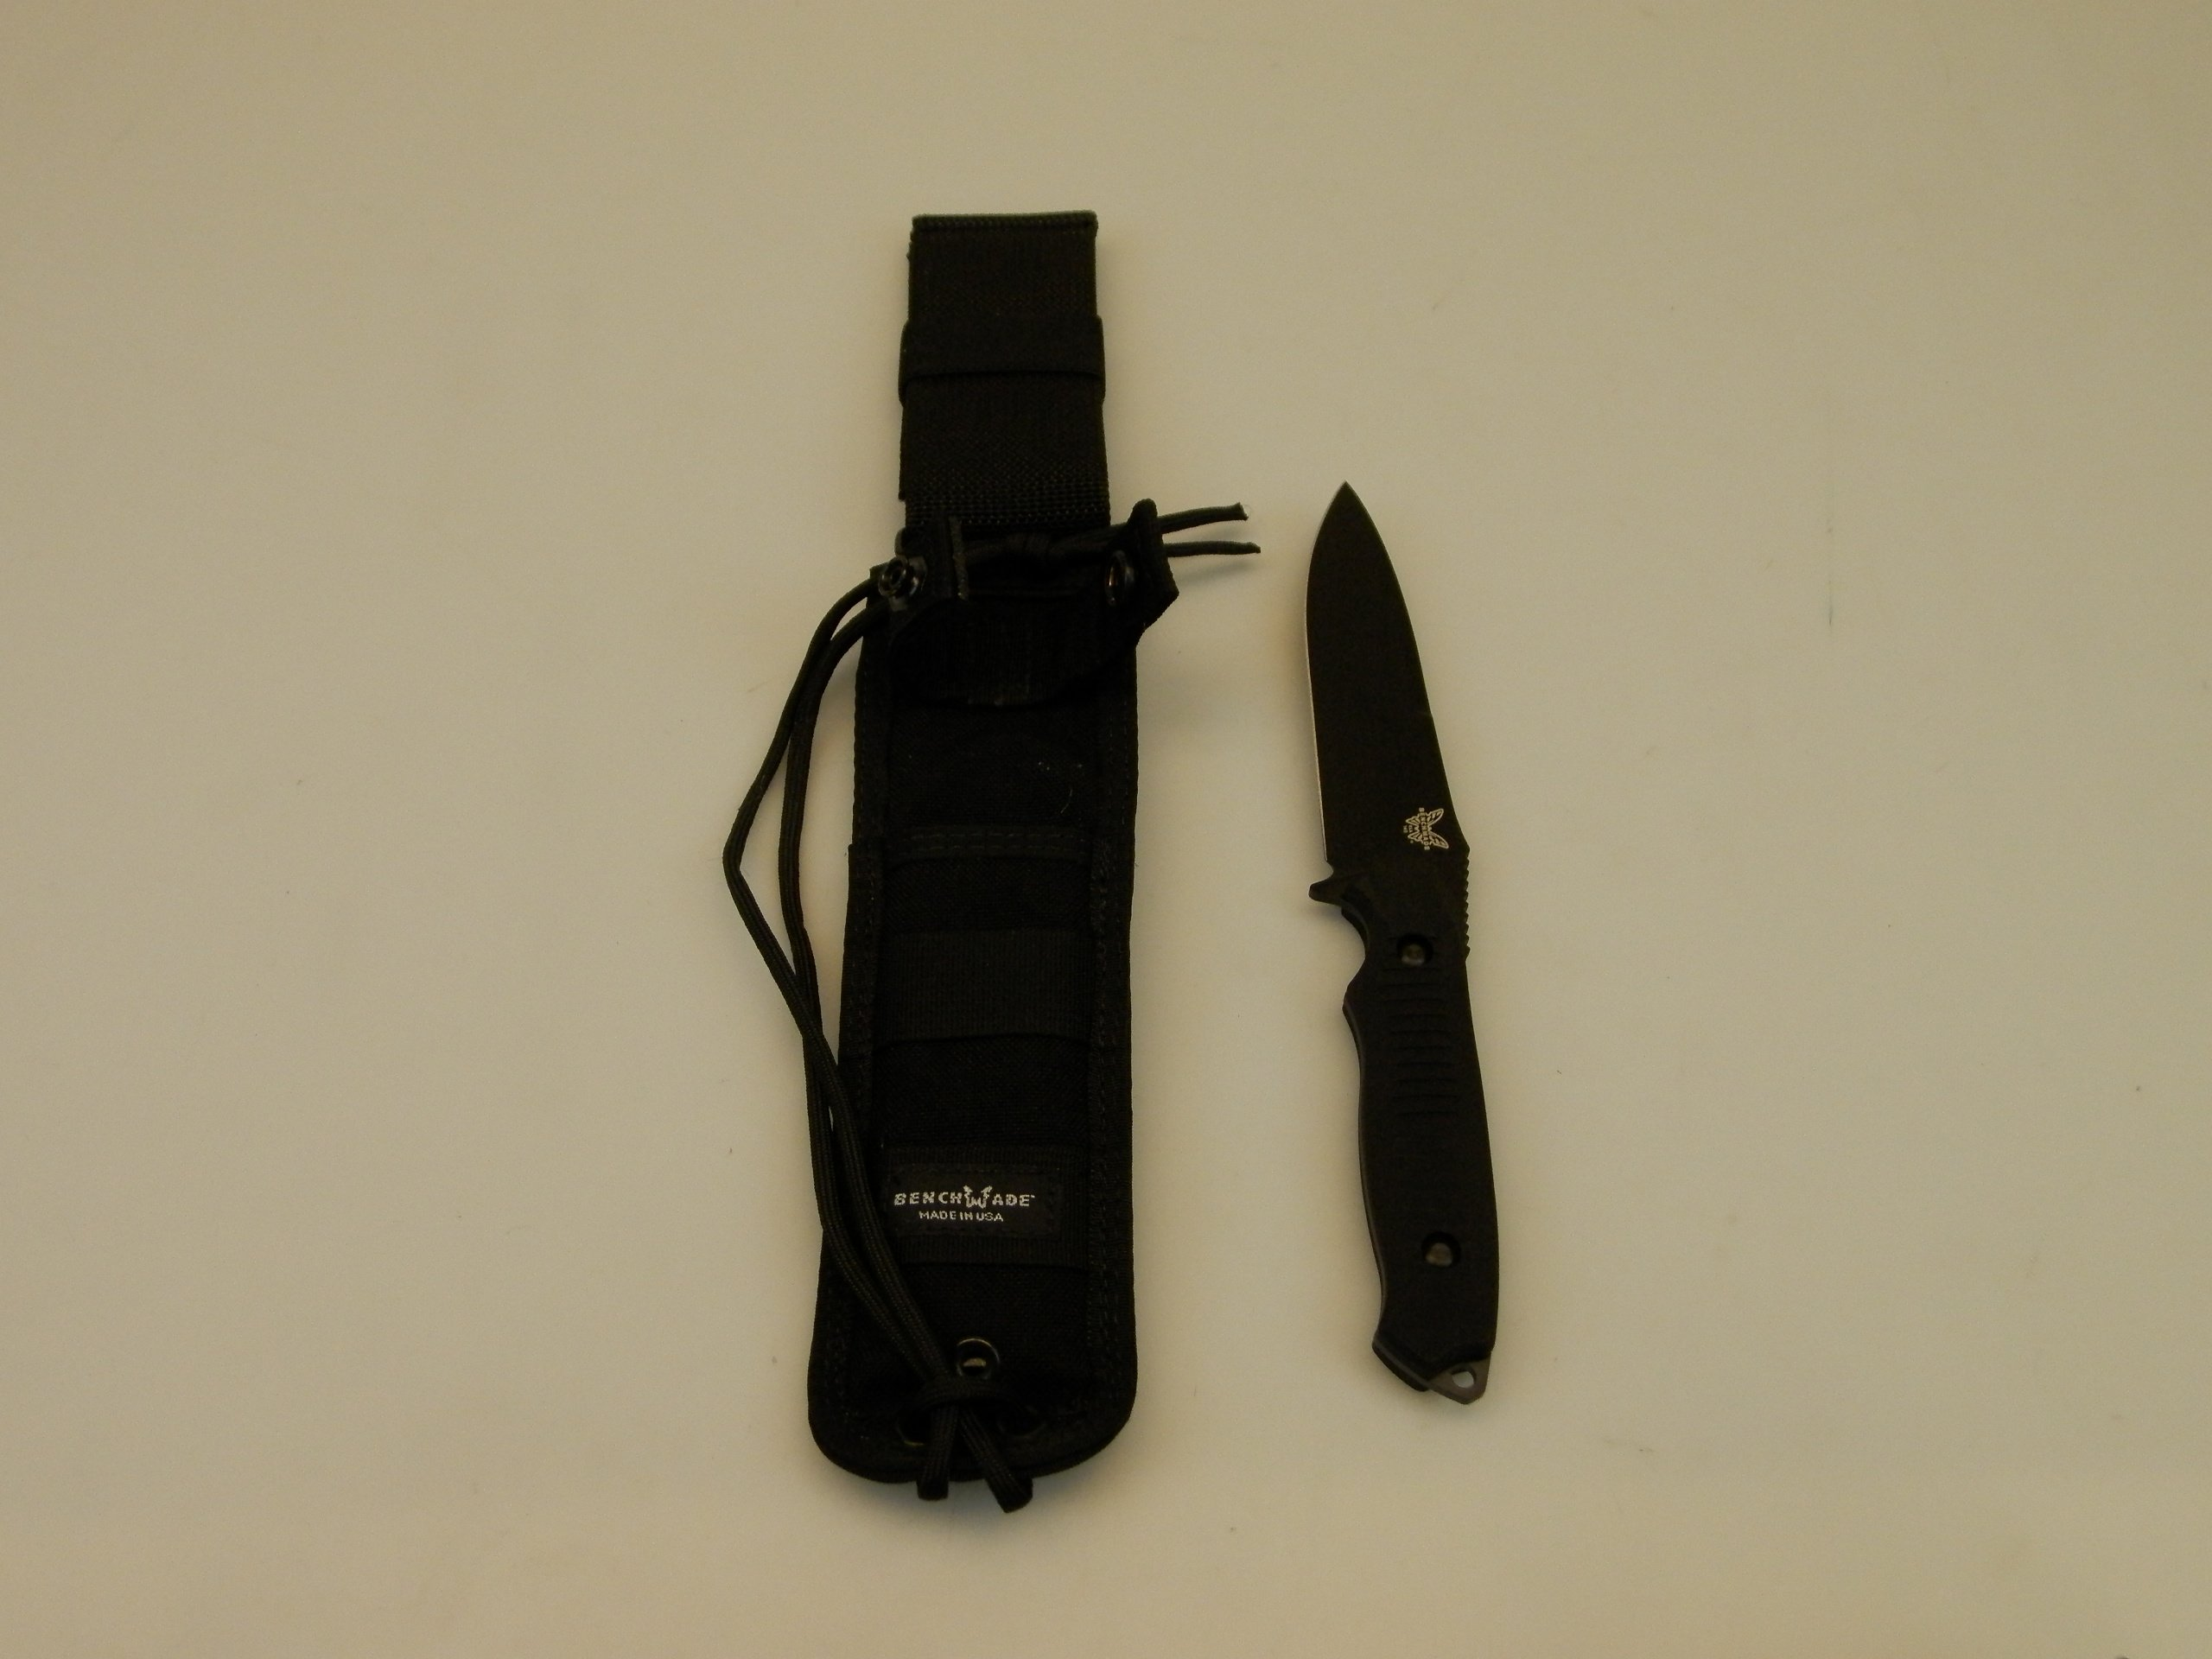 Benchmade Knife 140BK Nimravus, Fixed Black Blade, Black Handle by Benchmade (Image #1)